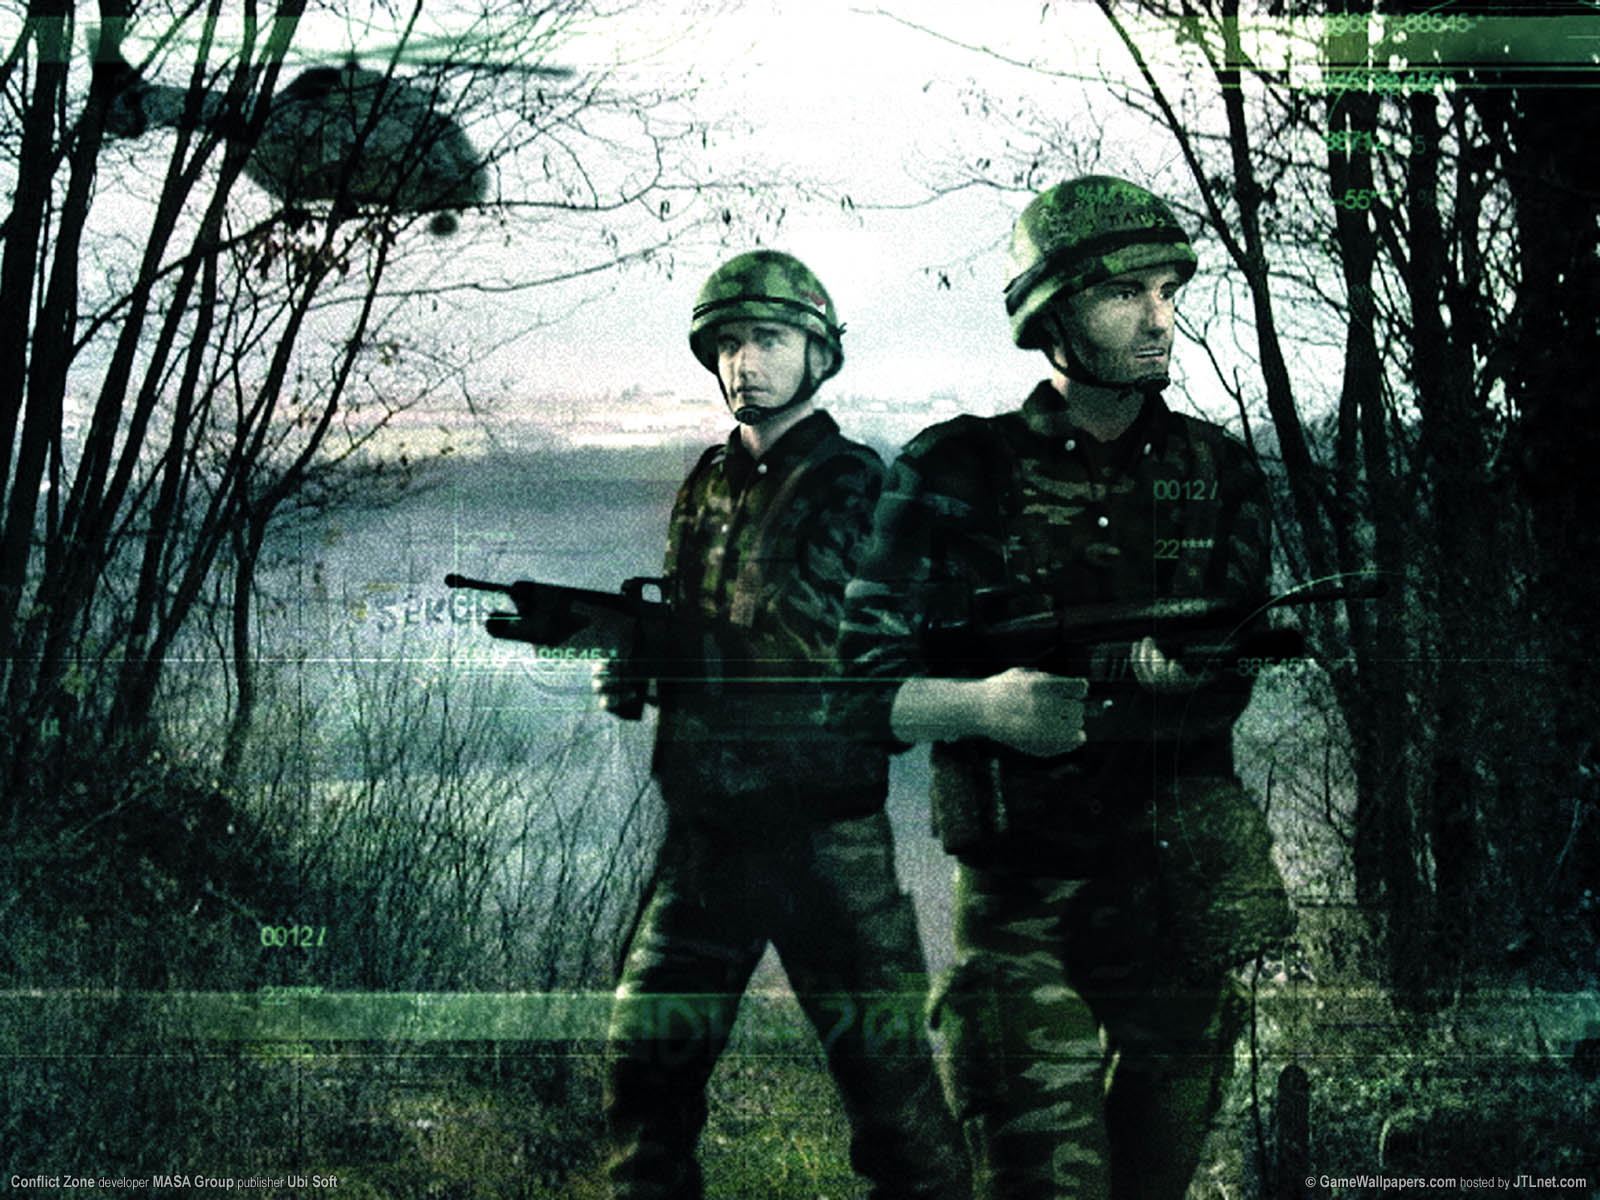 Conflict Zone Hintergrundbild 01 1600x1200